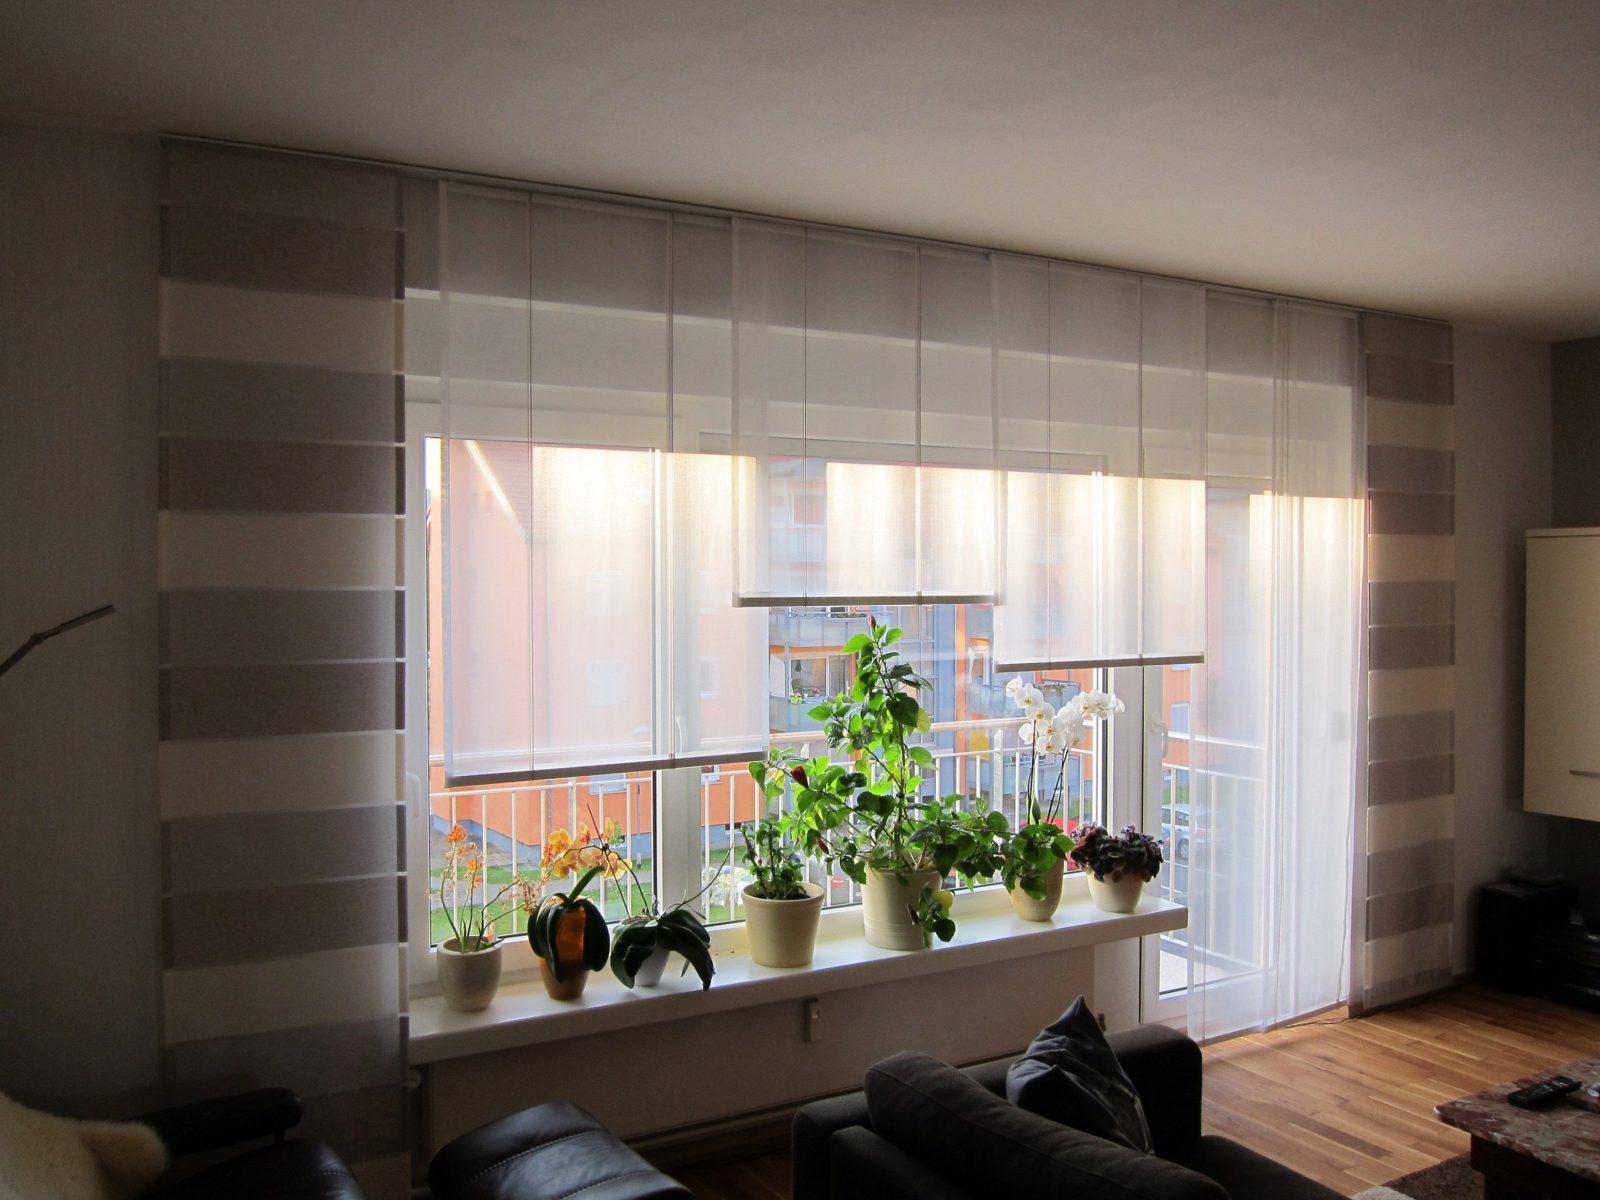 schiebevorh nge kurz und lang haus design ideen. Black Bedroom Furniture Sets. Home Design Ideas